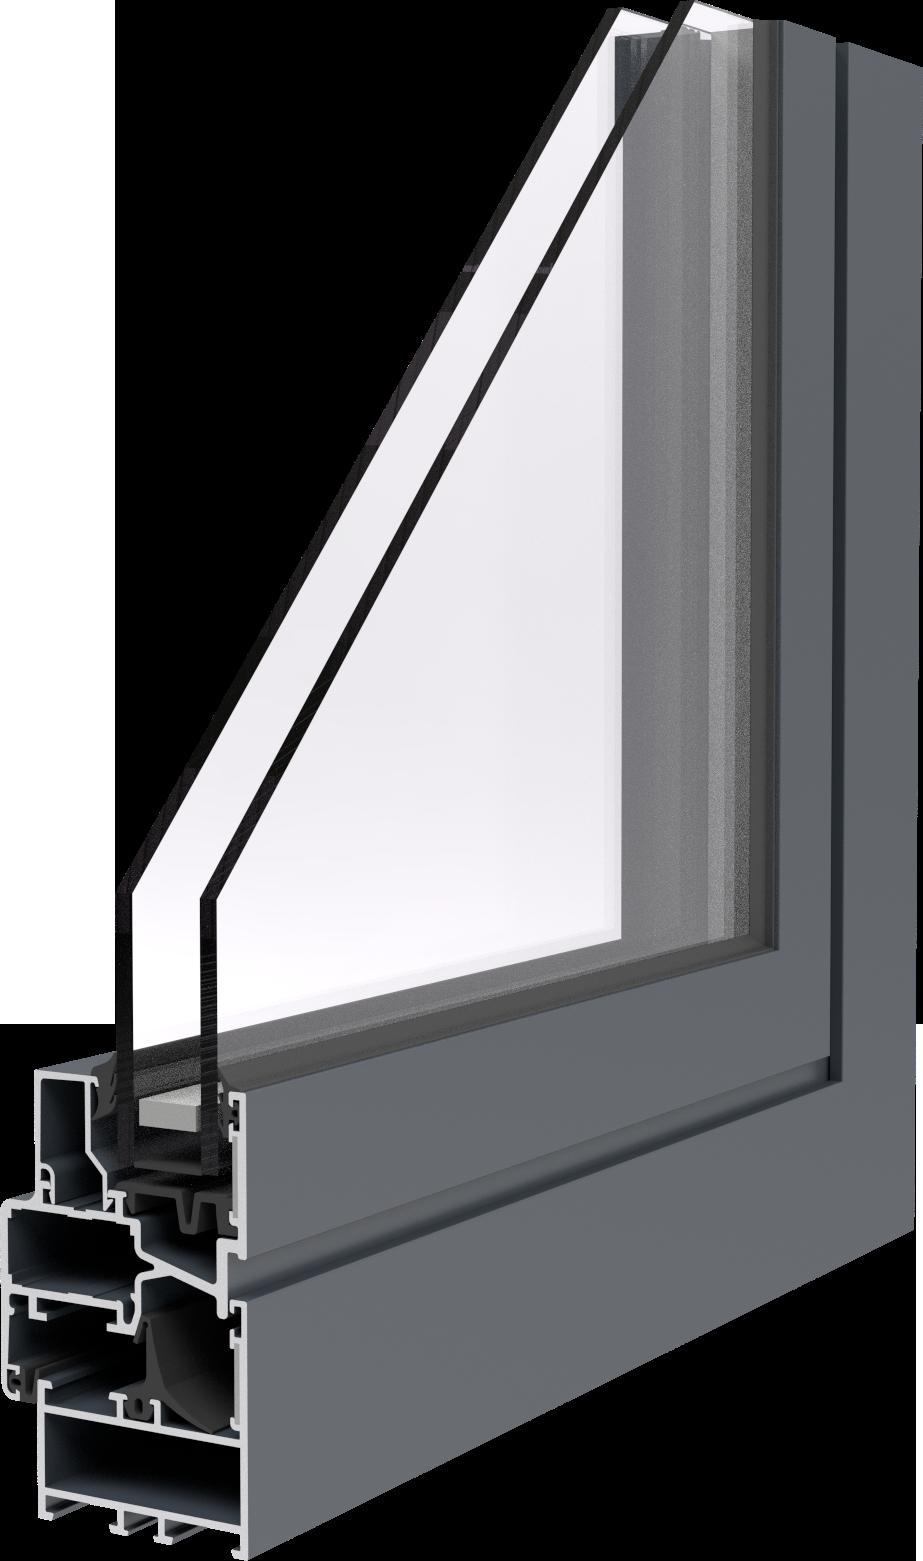 Aliplast-Econoline-skrzydlo-okienne